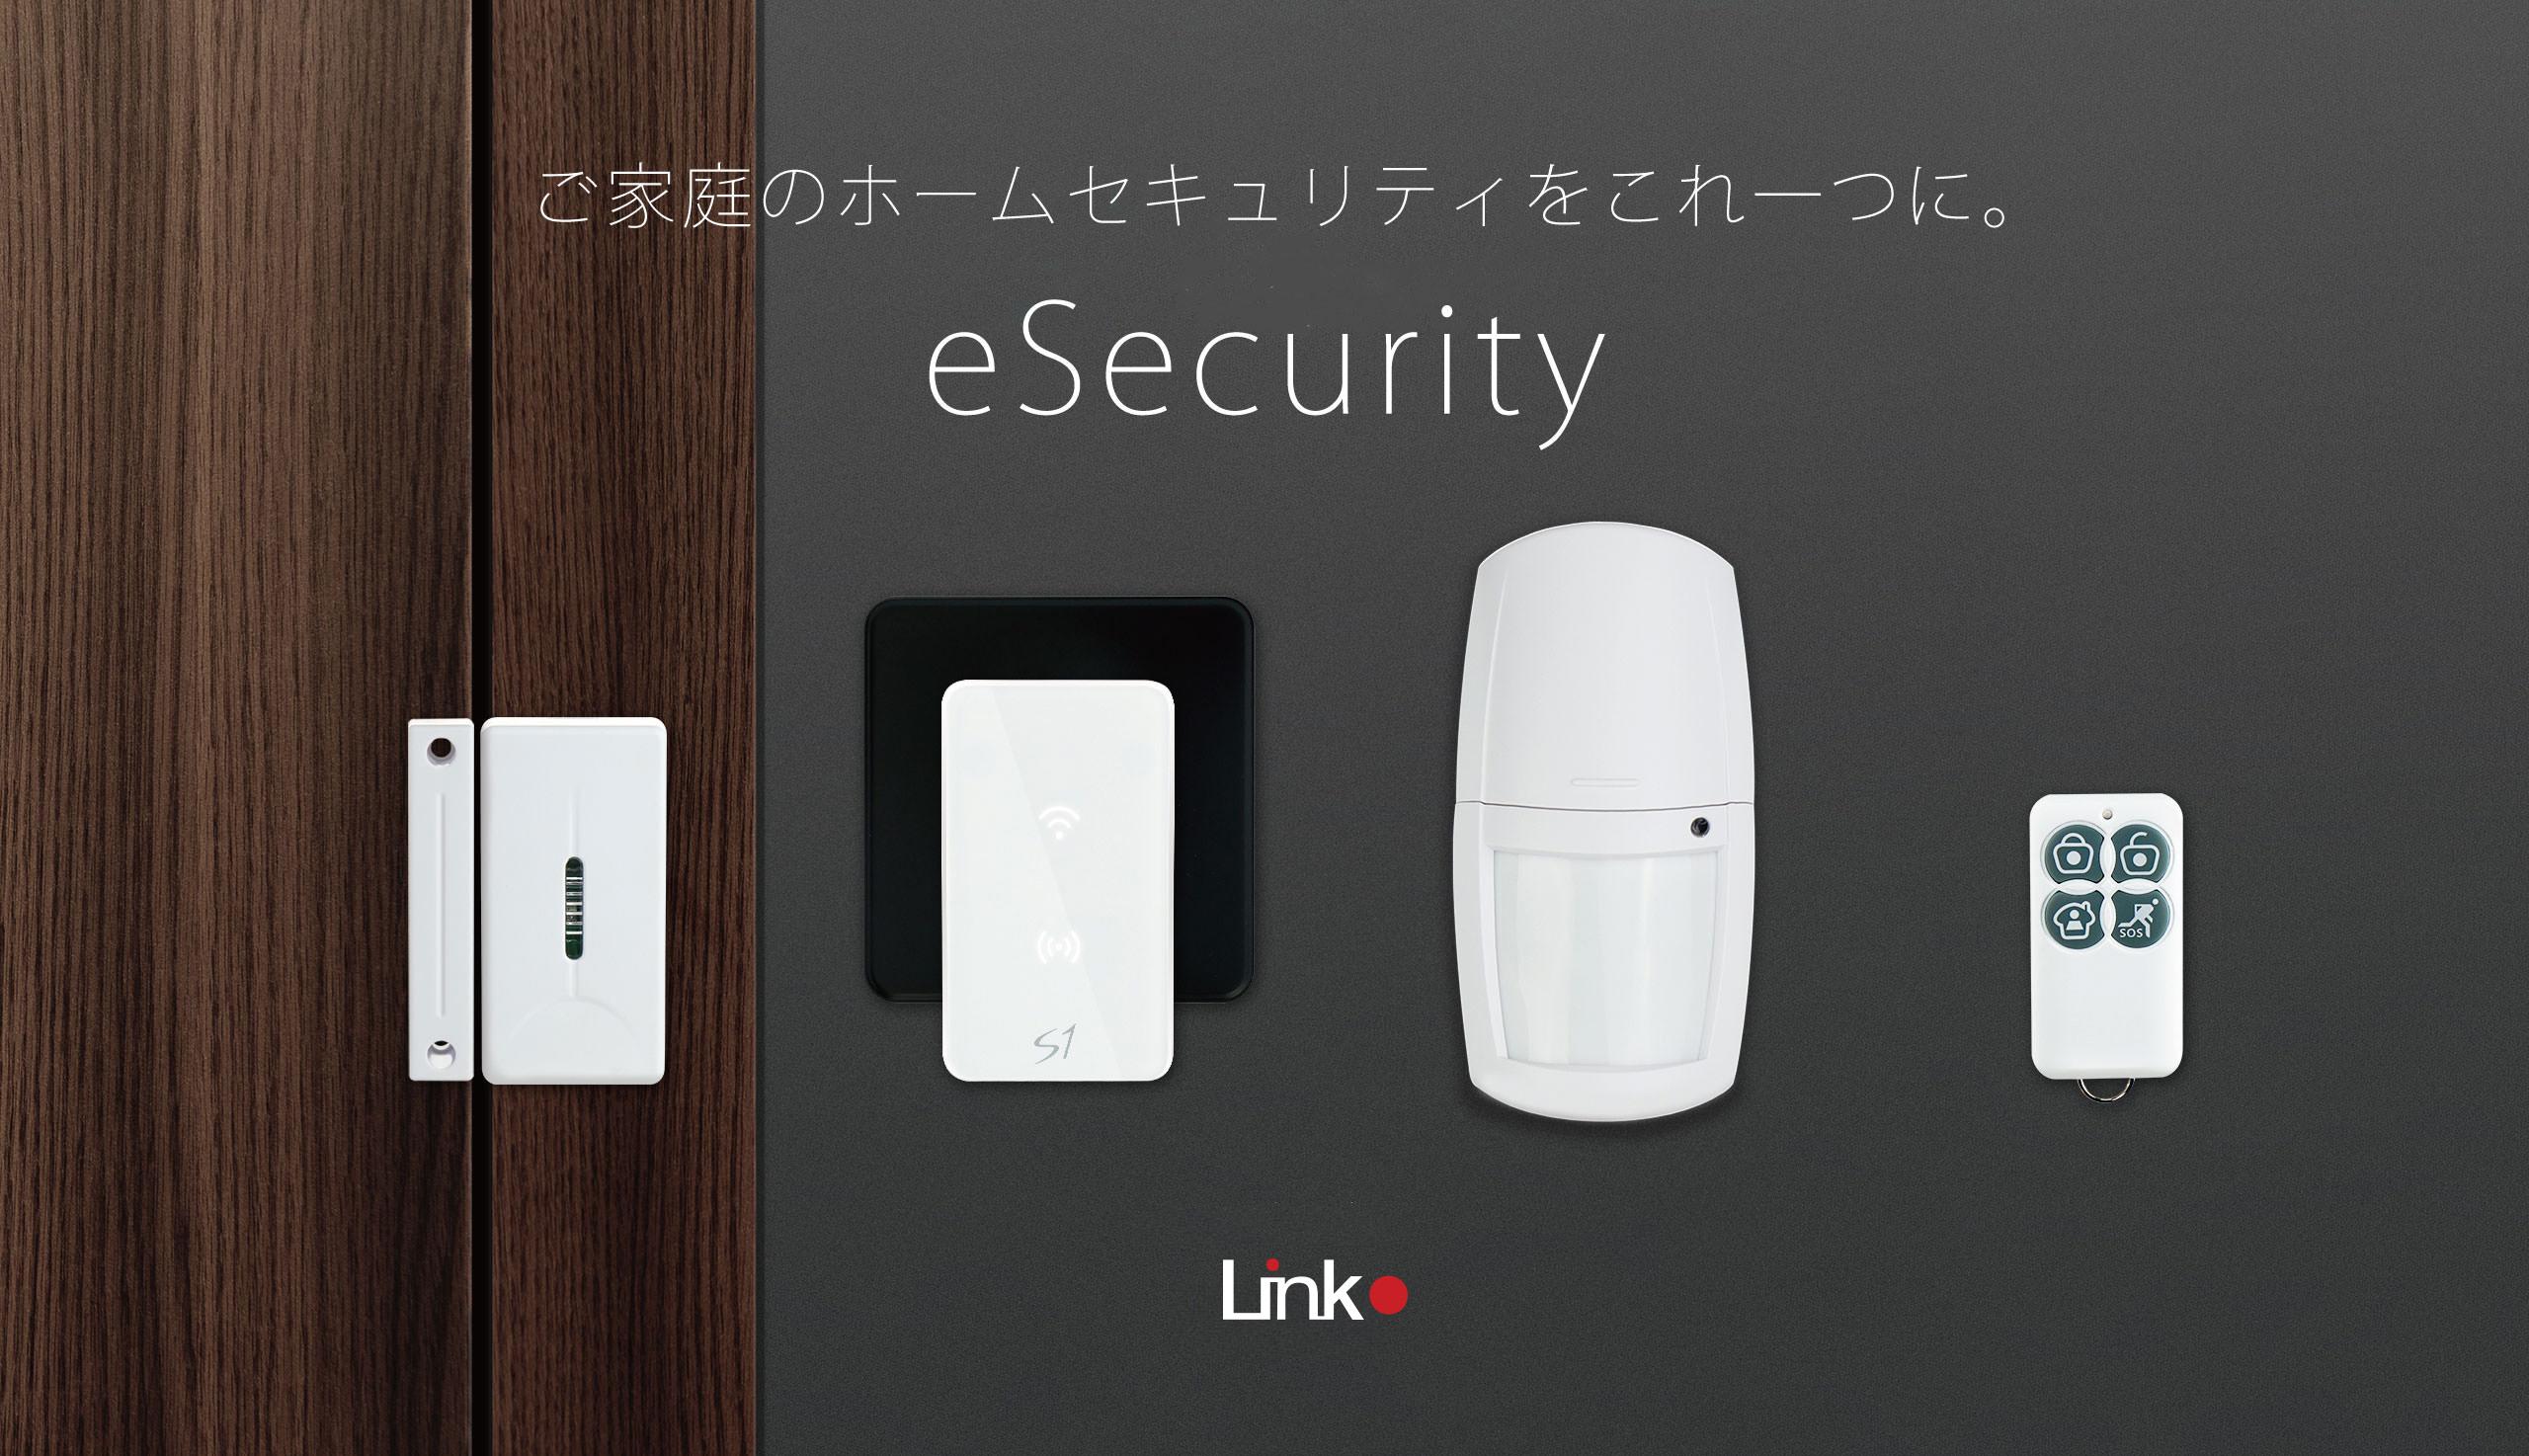 eSecurity IoT 家電 スマートホーム・スマートハウス Link Japanメイン画像